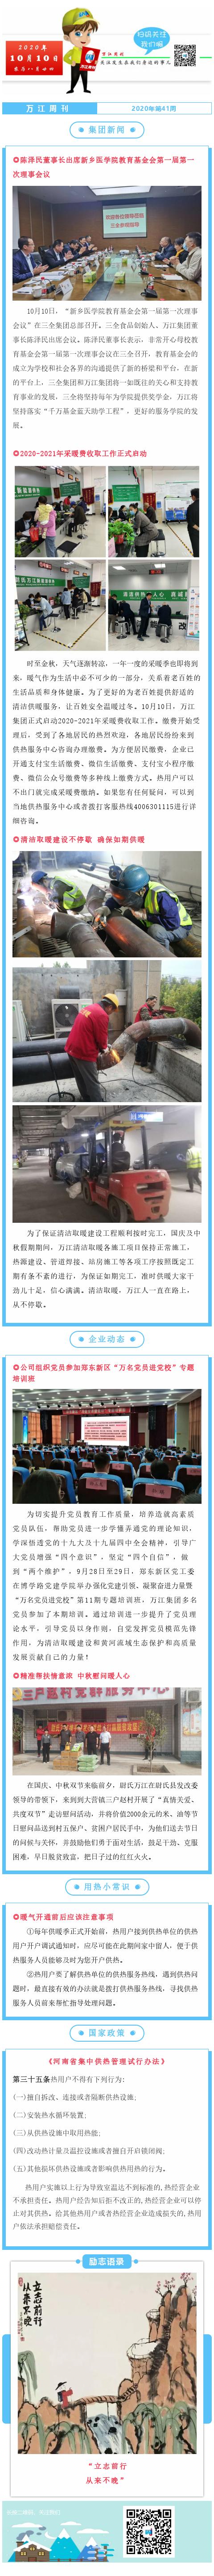 41周万江周刊.png